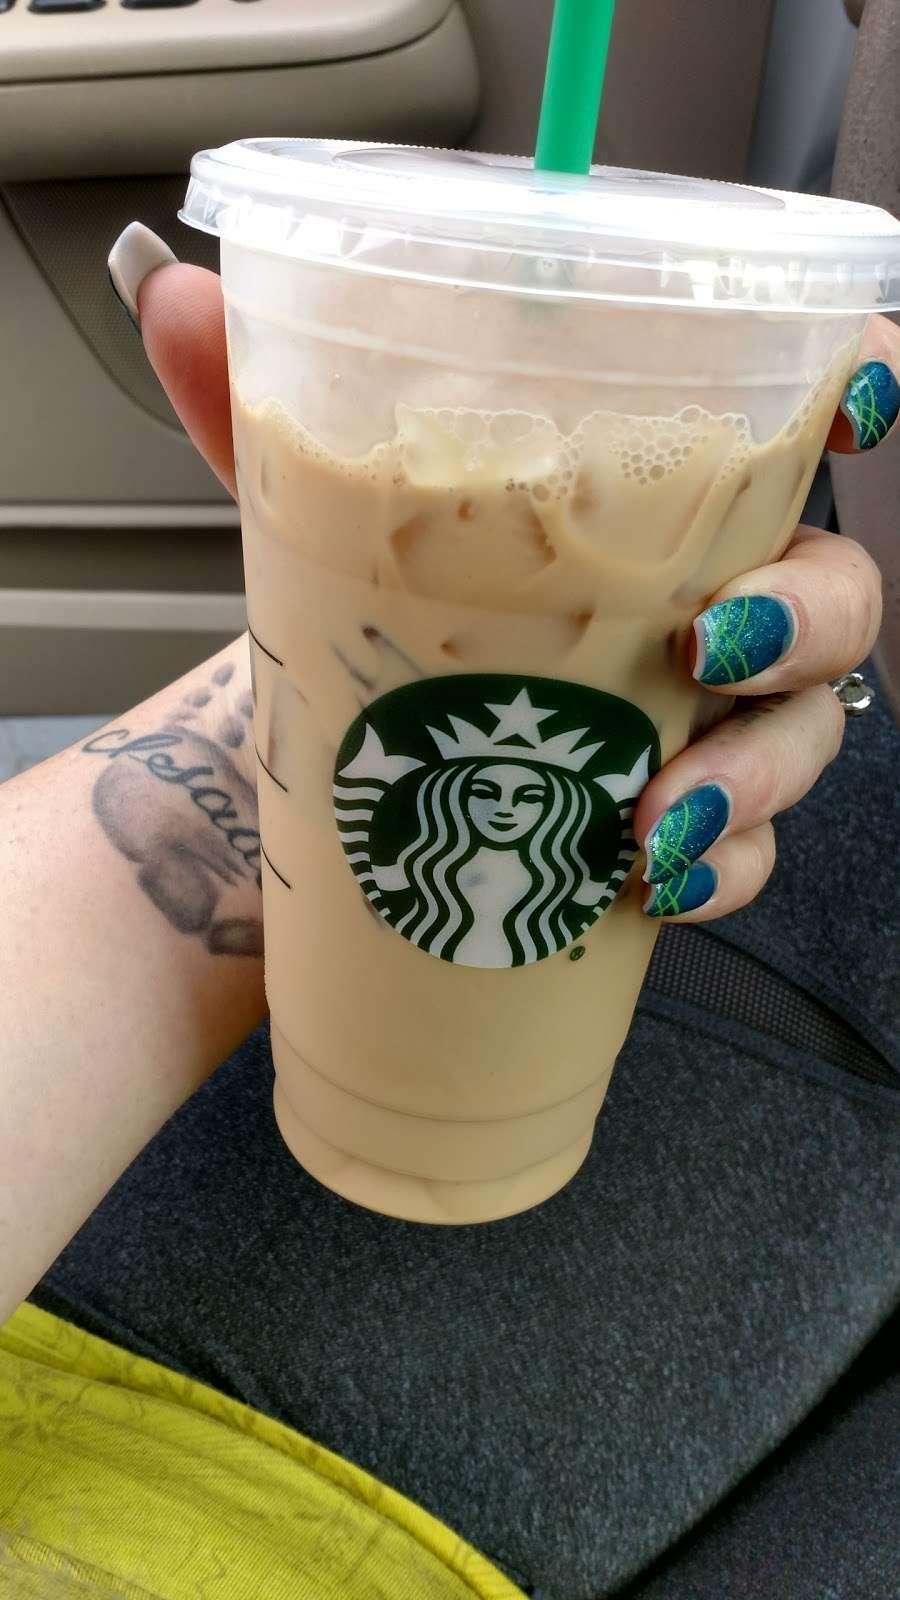 Starbucks - cafe    Photo 4 of 10   Address: 14835 Pomerado Rd, Poway, CA 92064, USA   Phone: (858) 391-1003